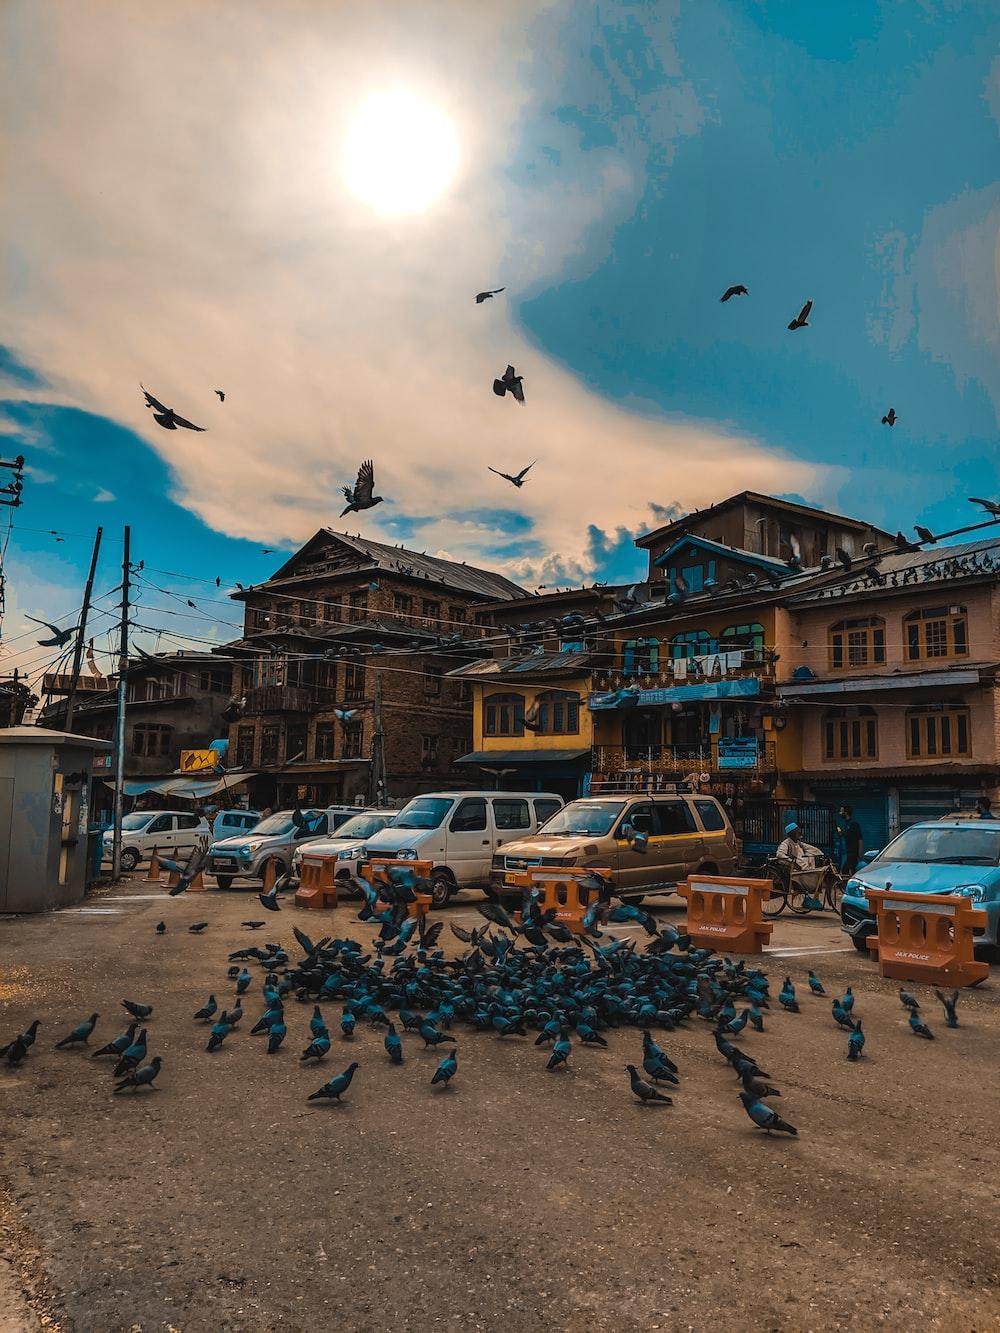 birds near parked vehicles